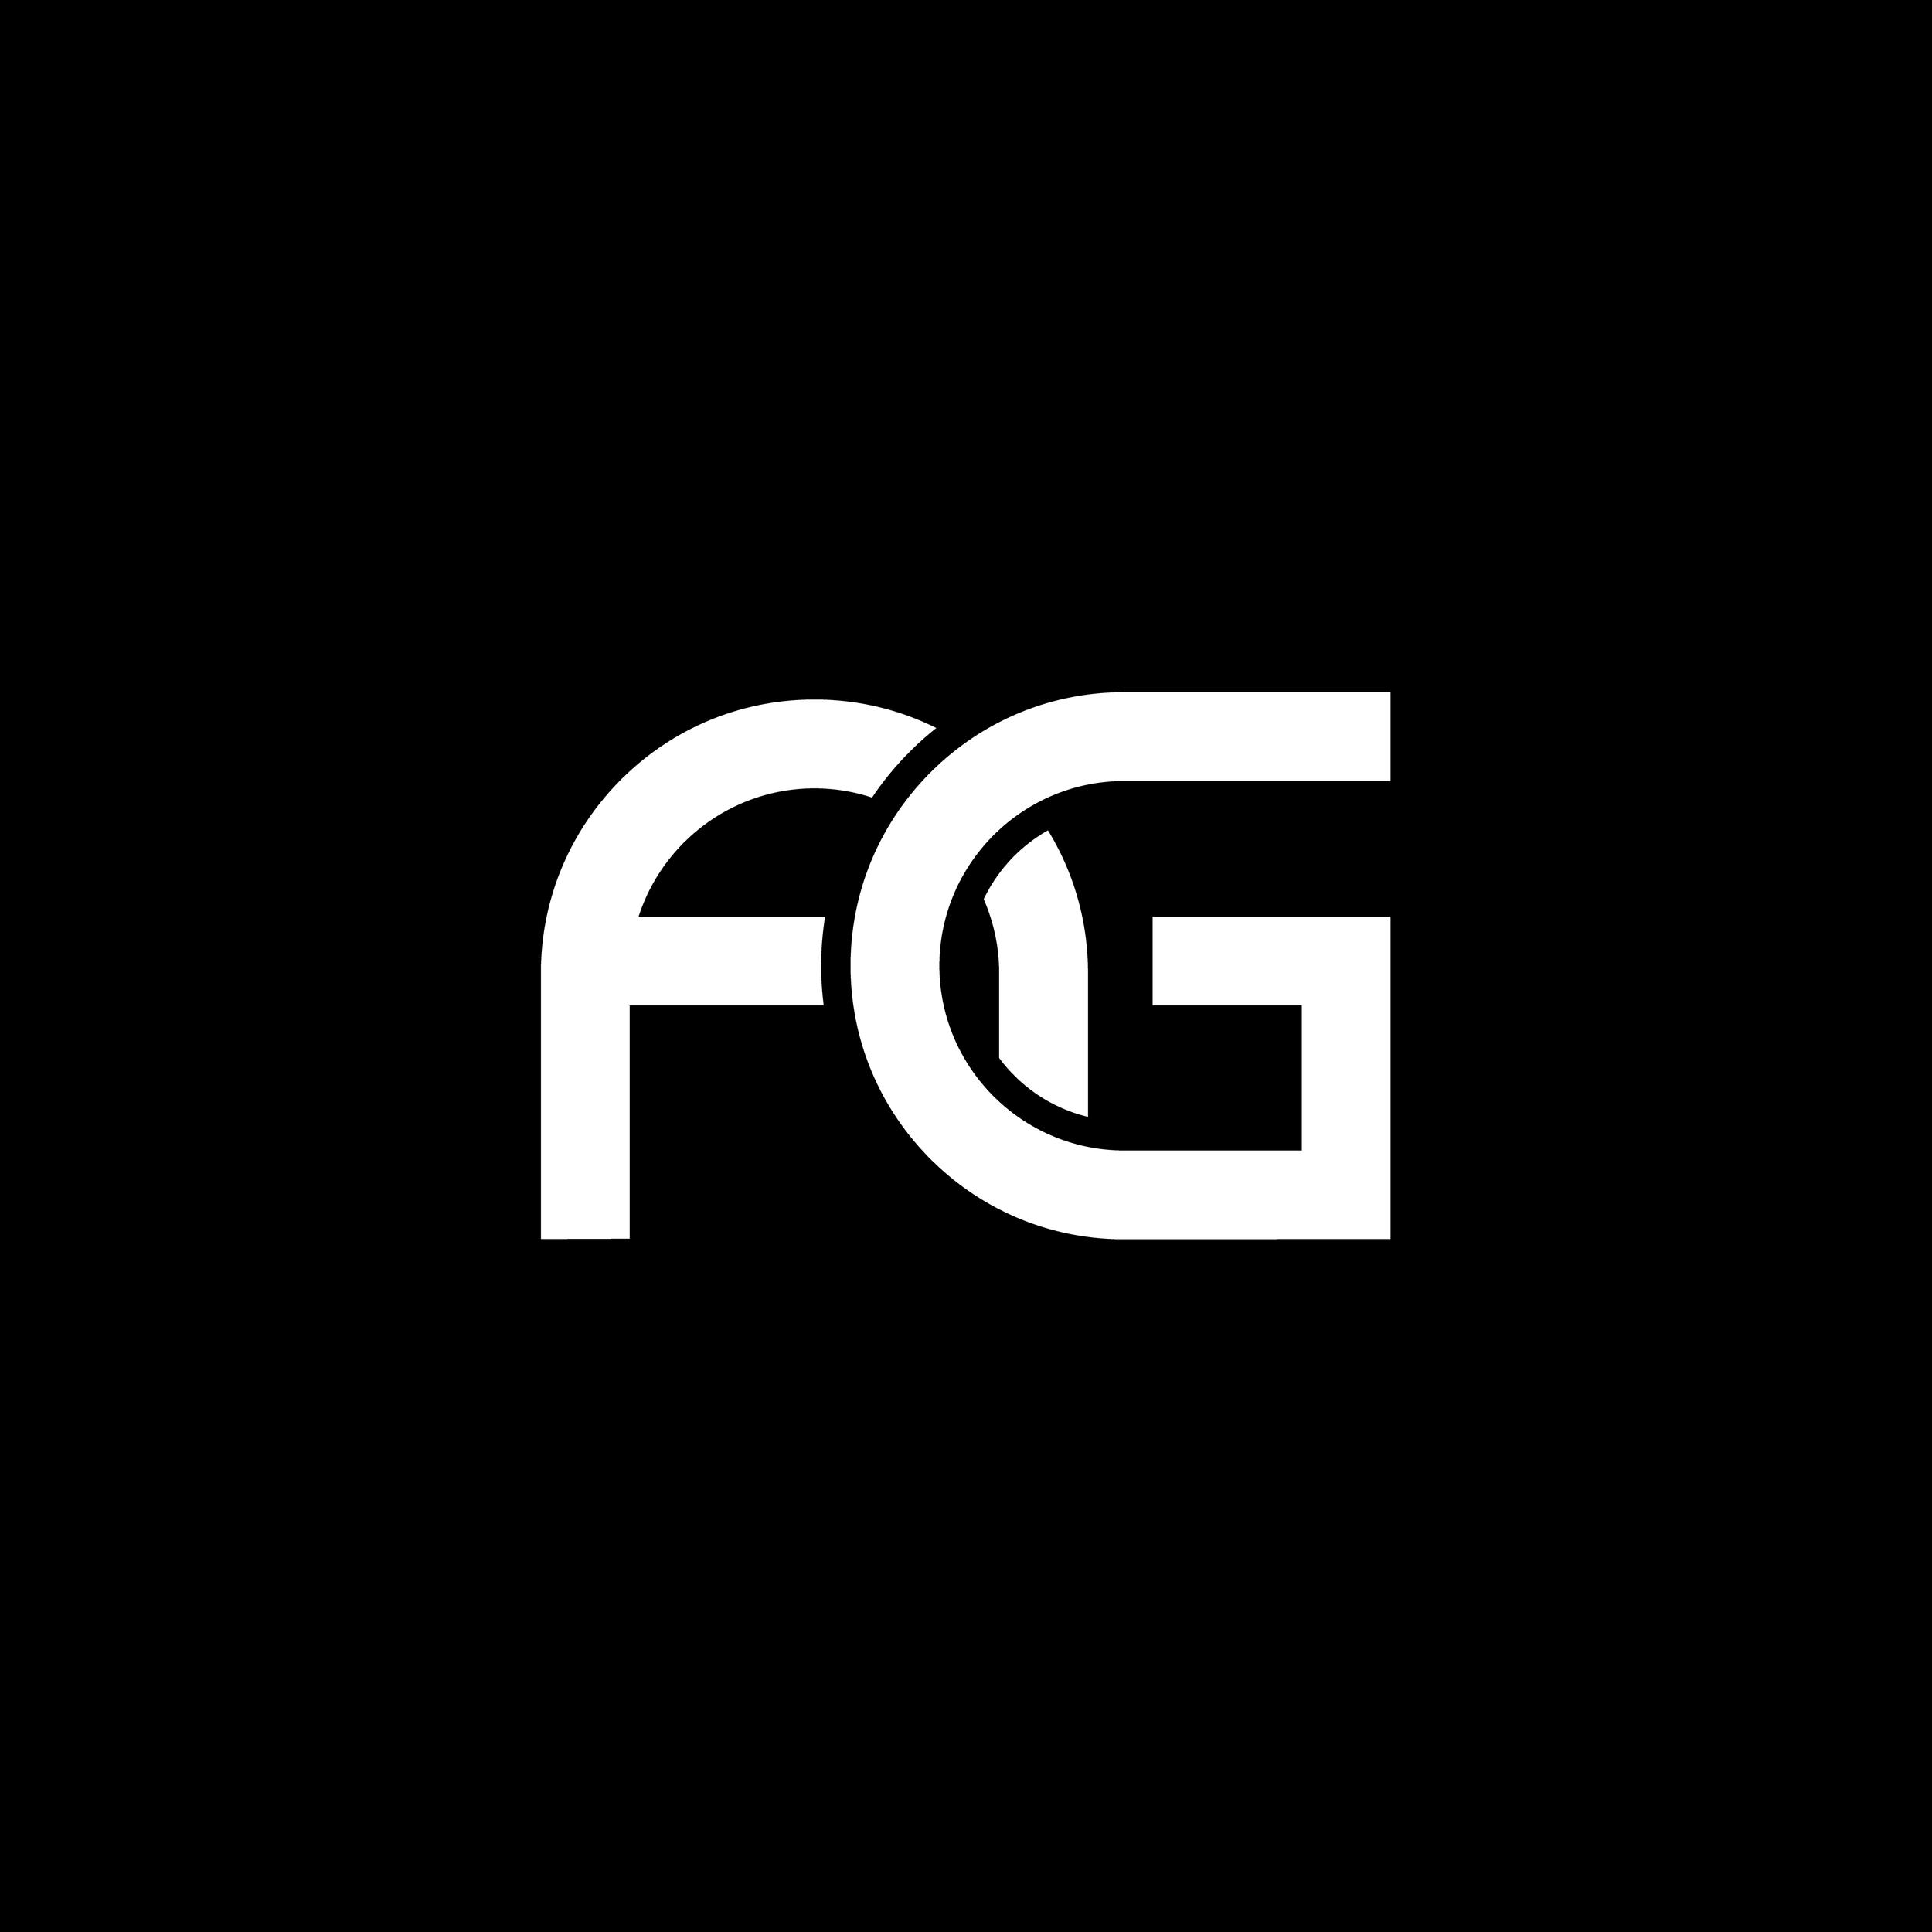 AG_LOGO_20.png